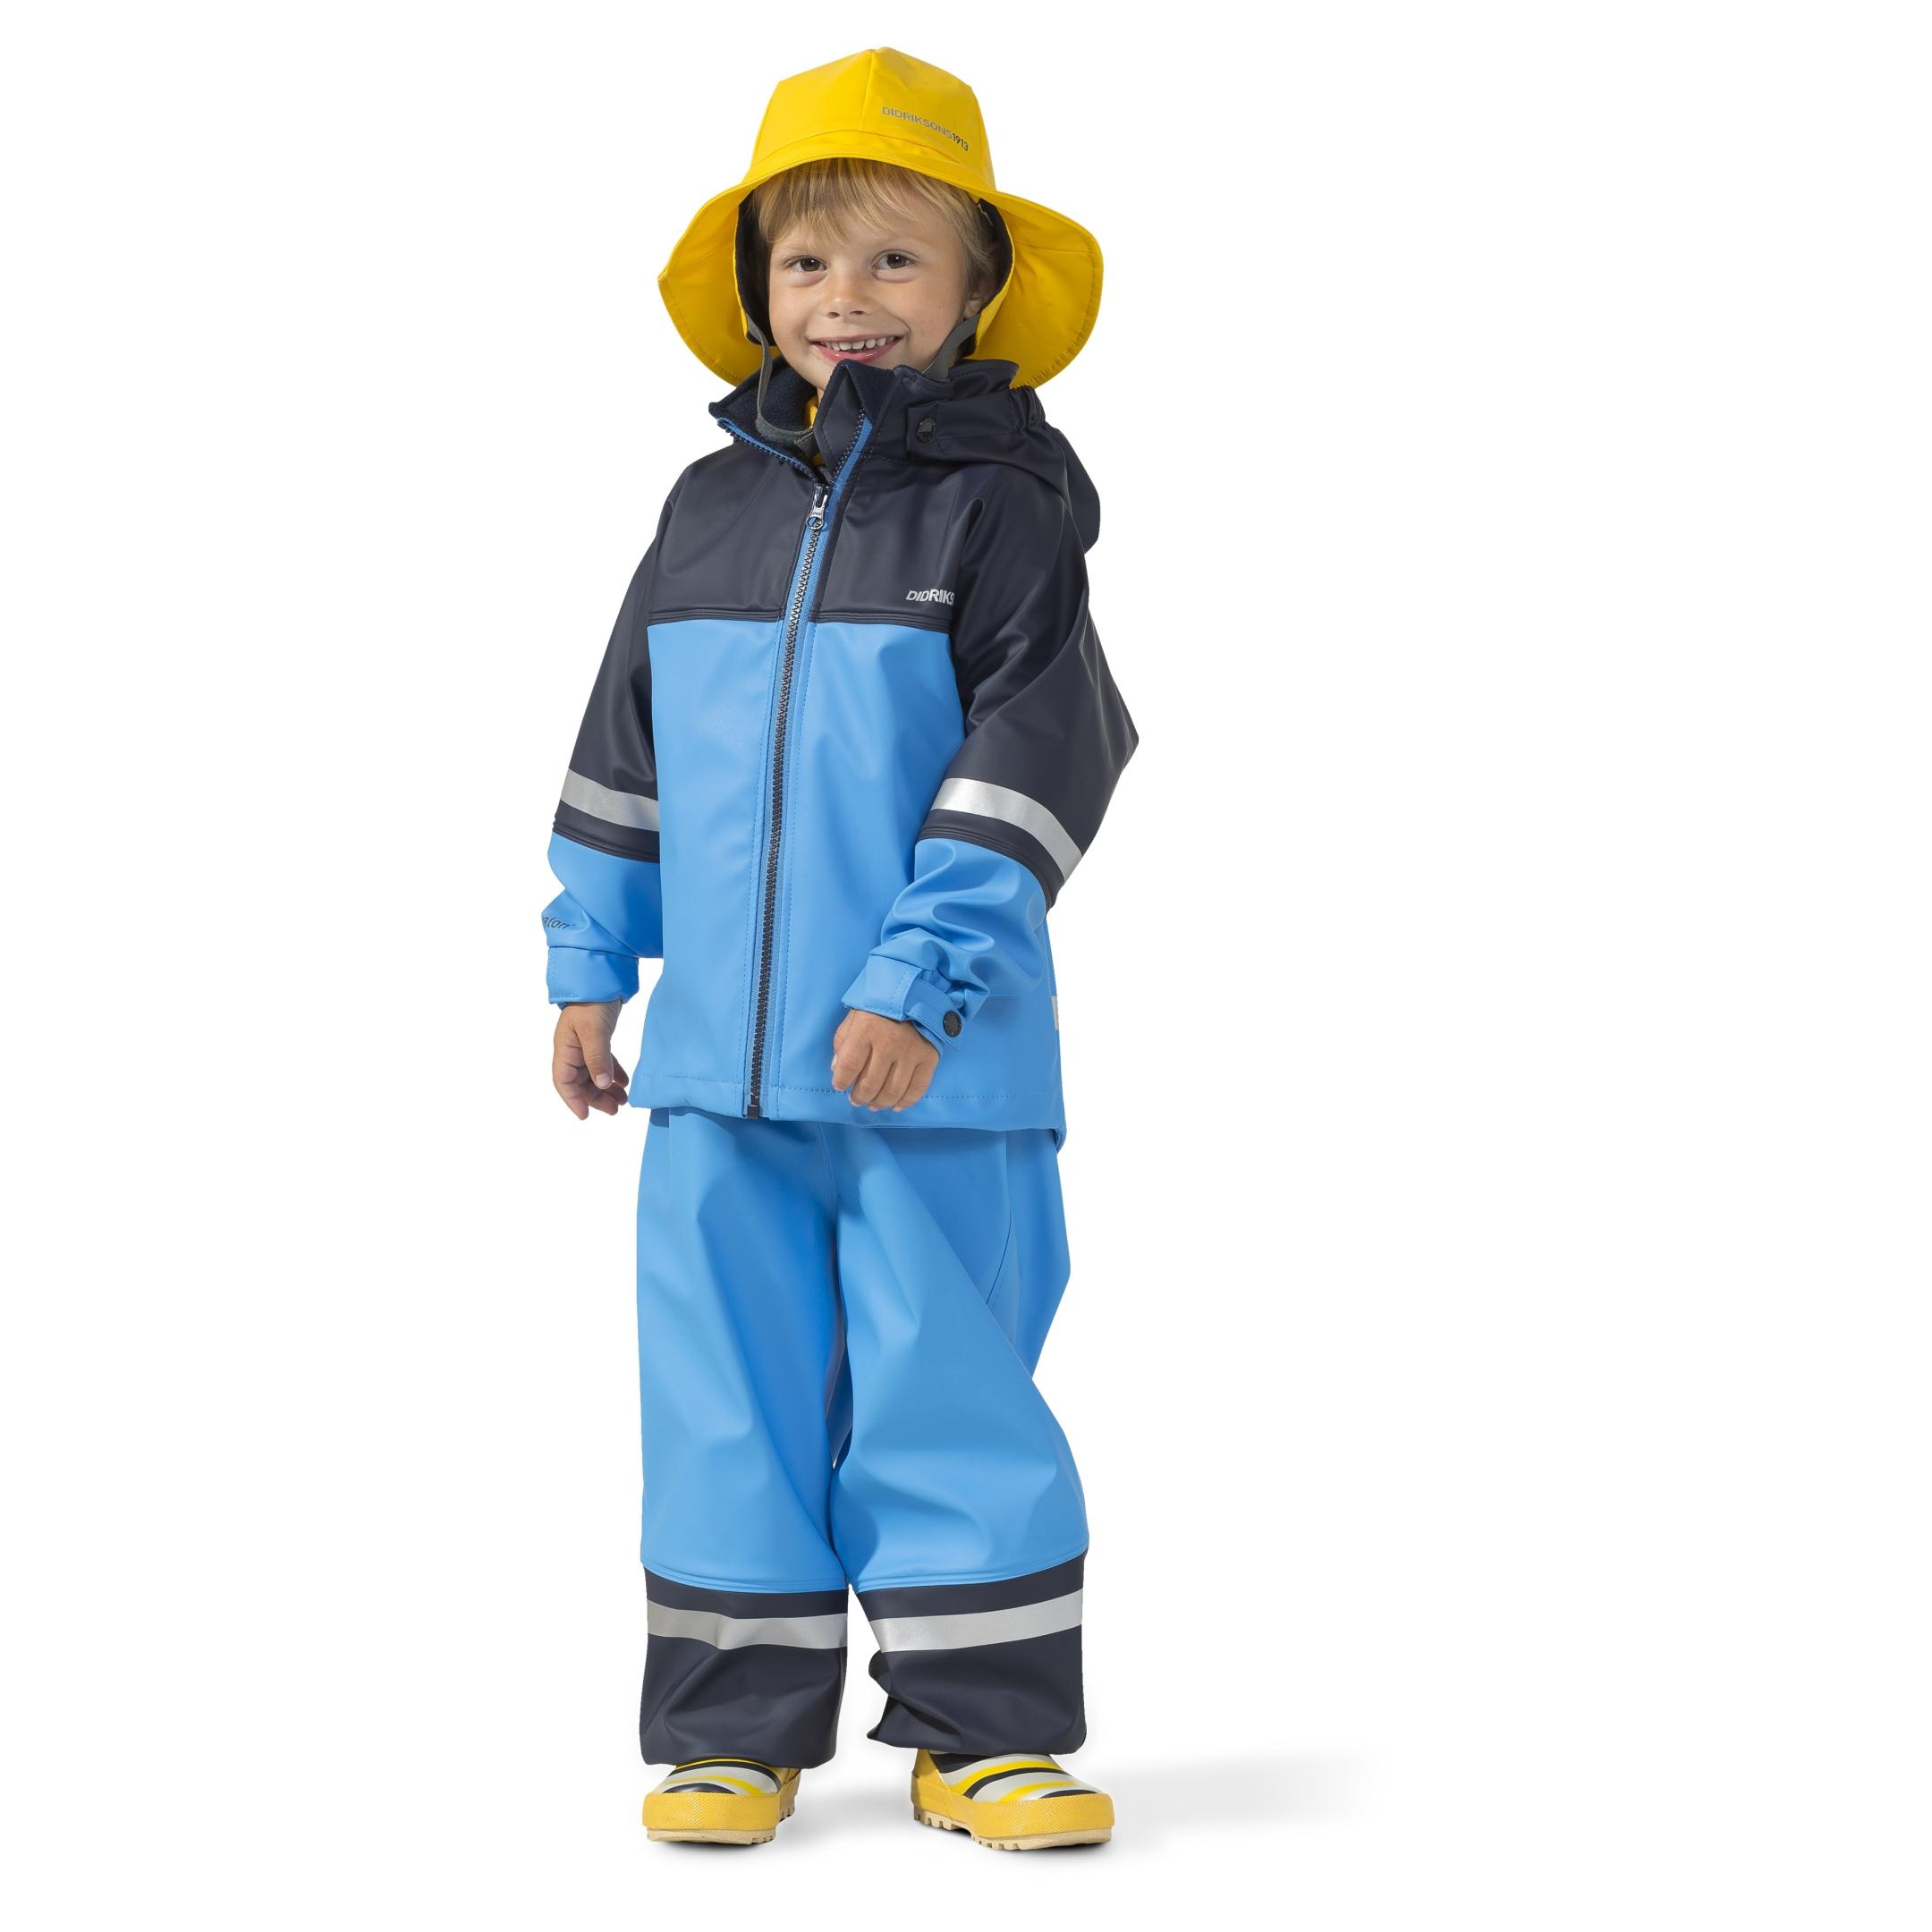 Дидриксон детский костюм дождевой WATERMAN + средство для стирки, - фото 1